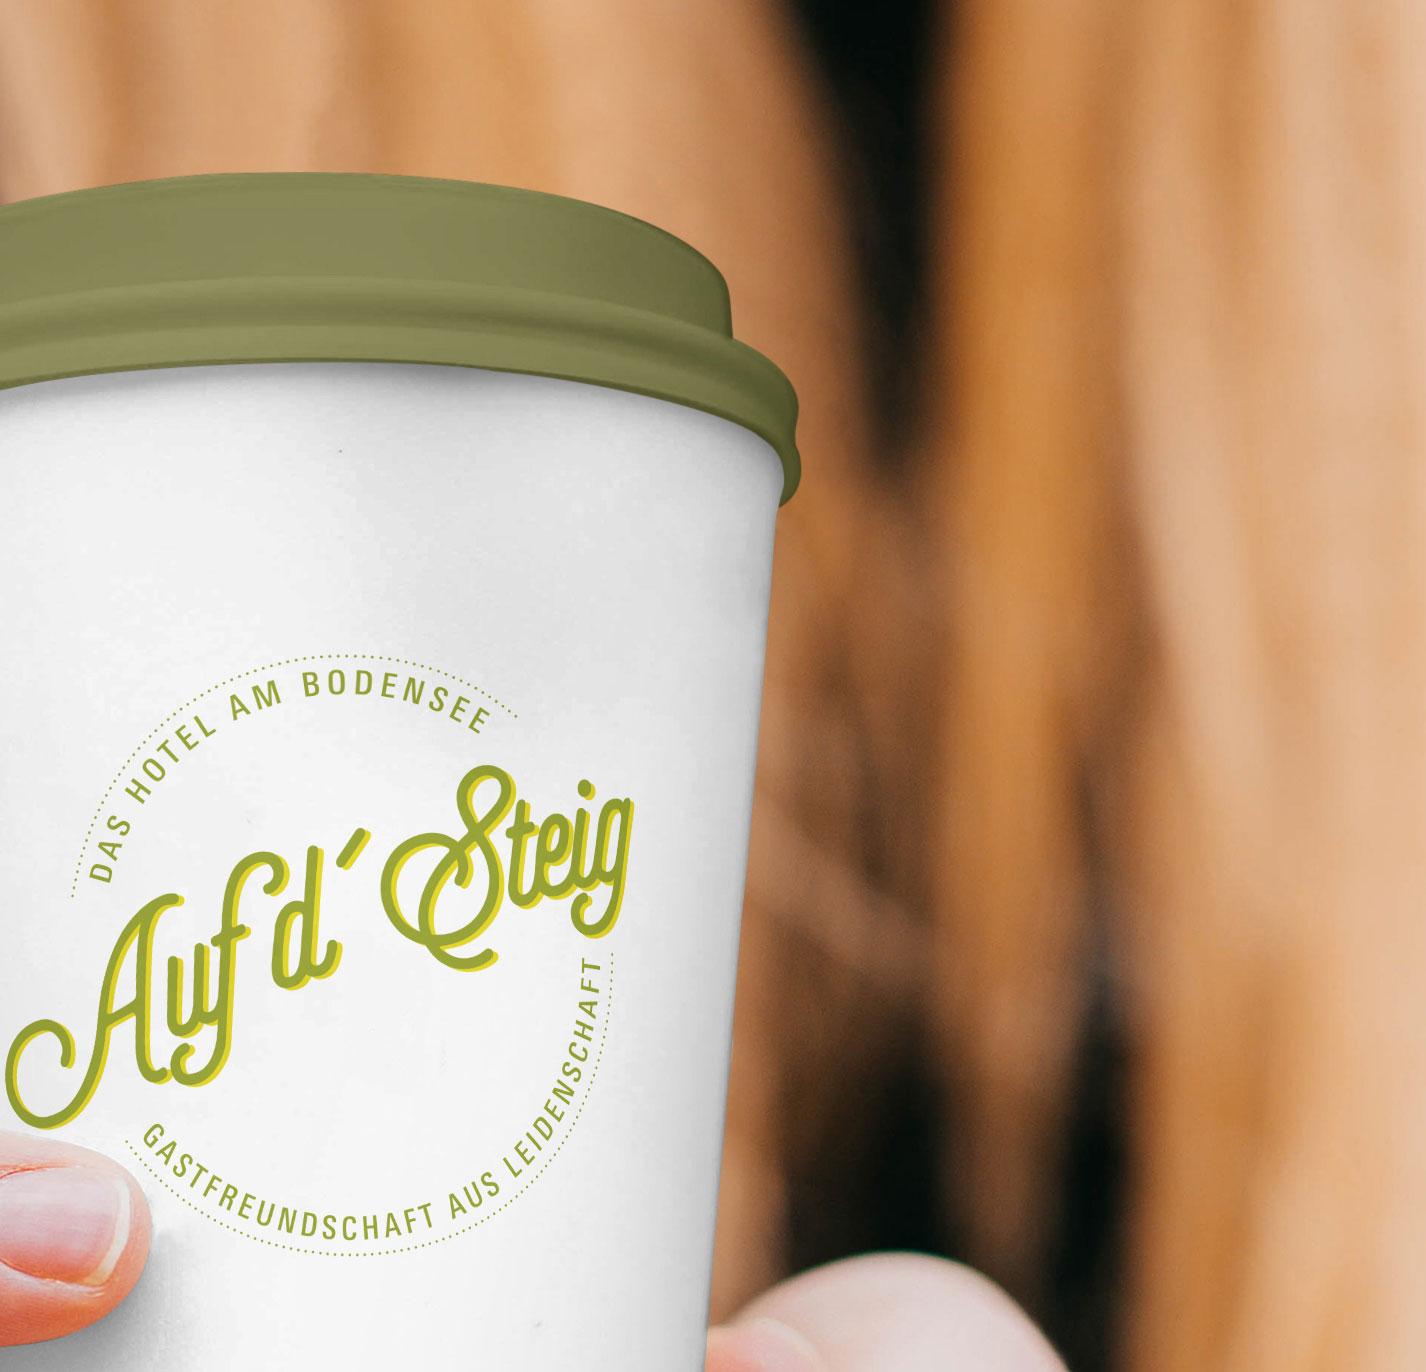 Steig_Hotel_Kaffee